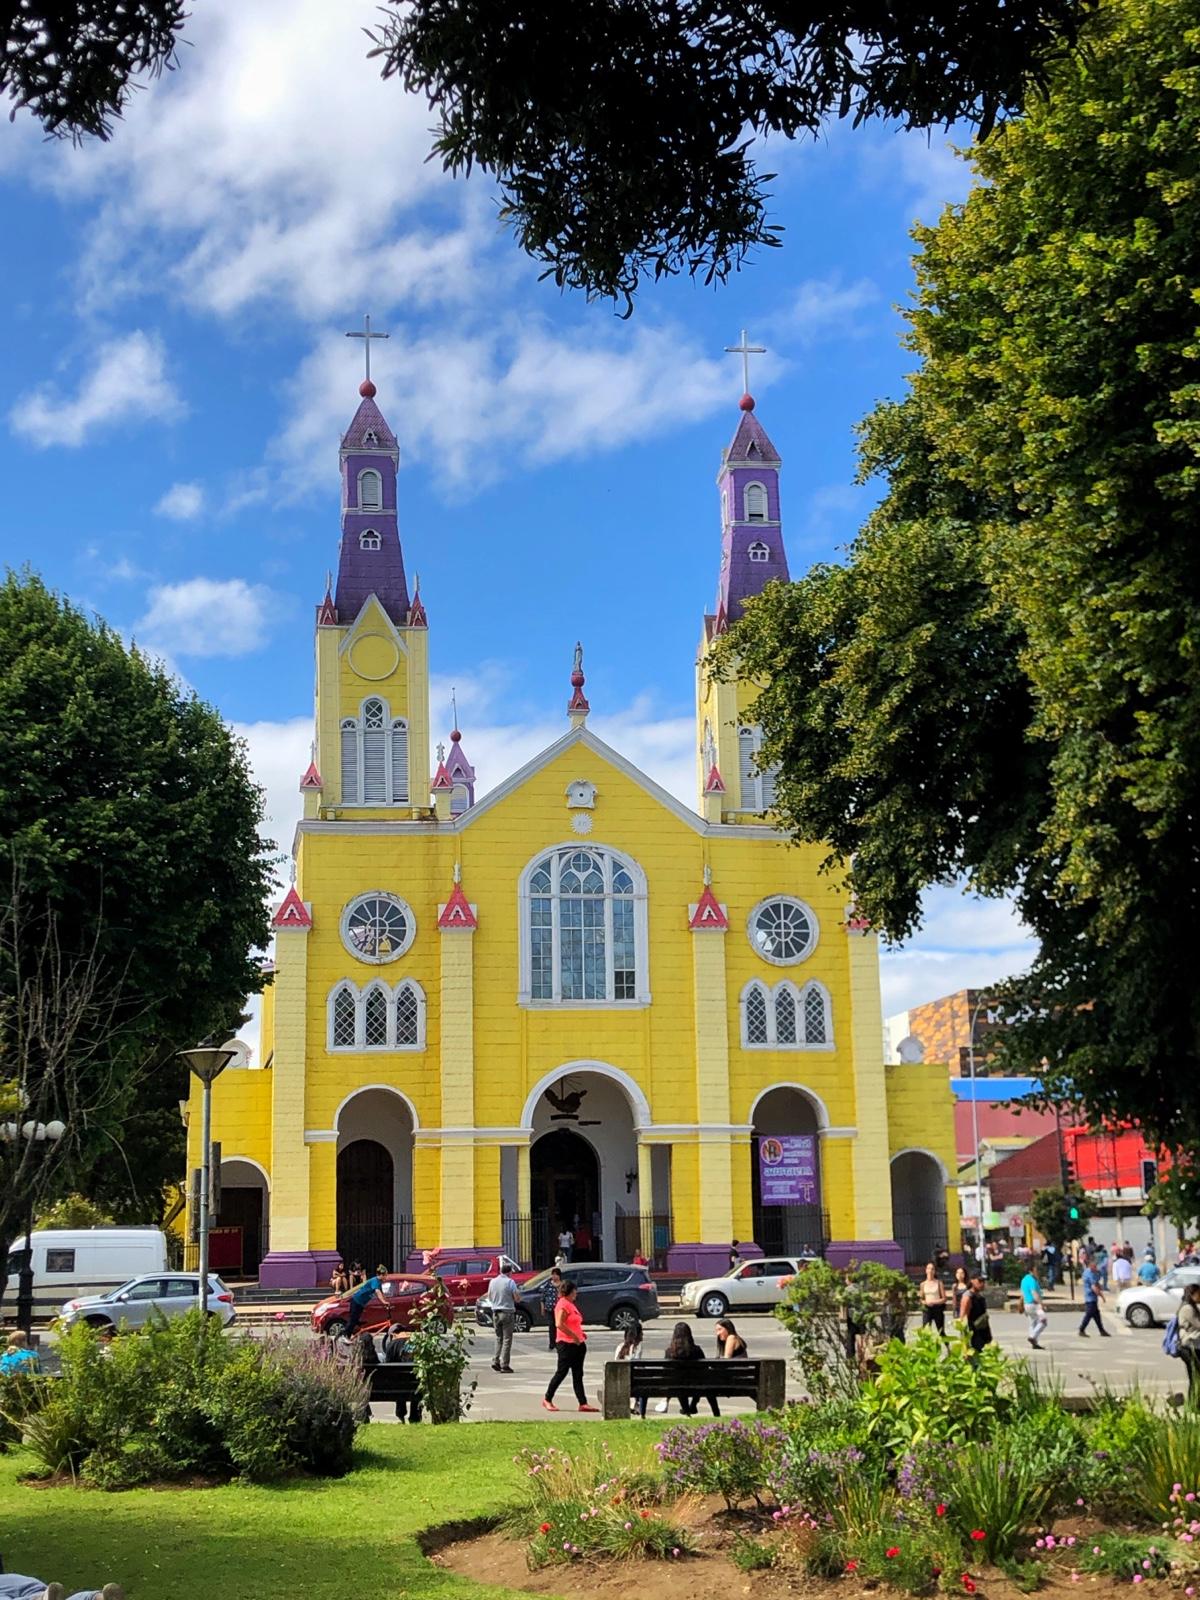 Church of San Francisco